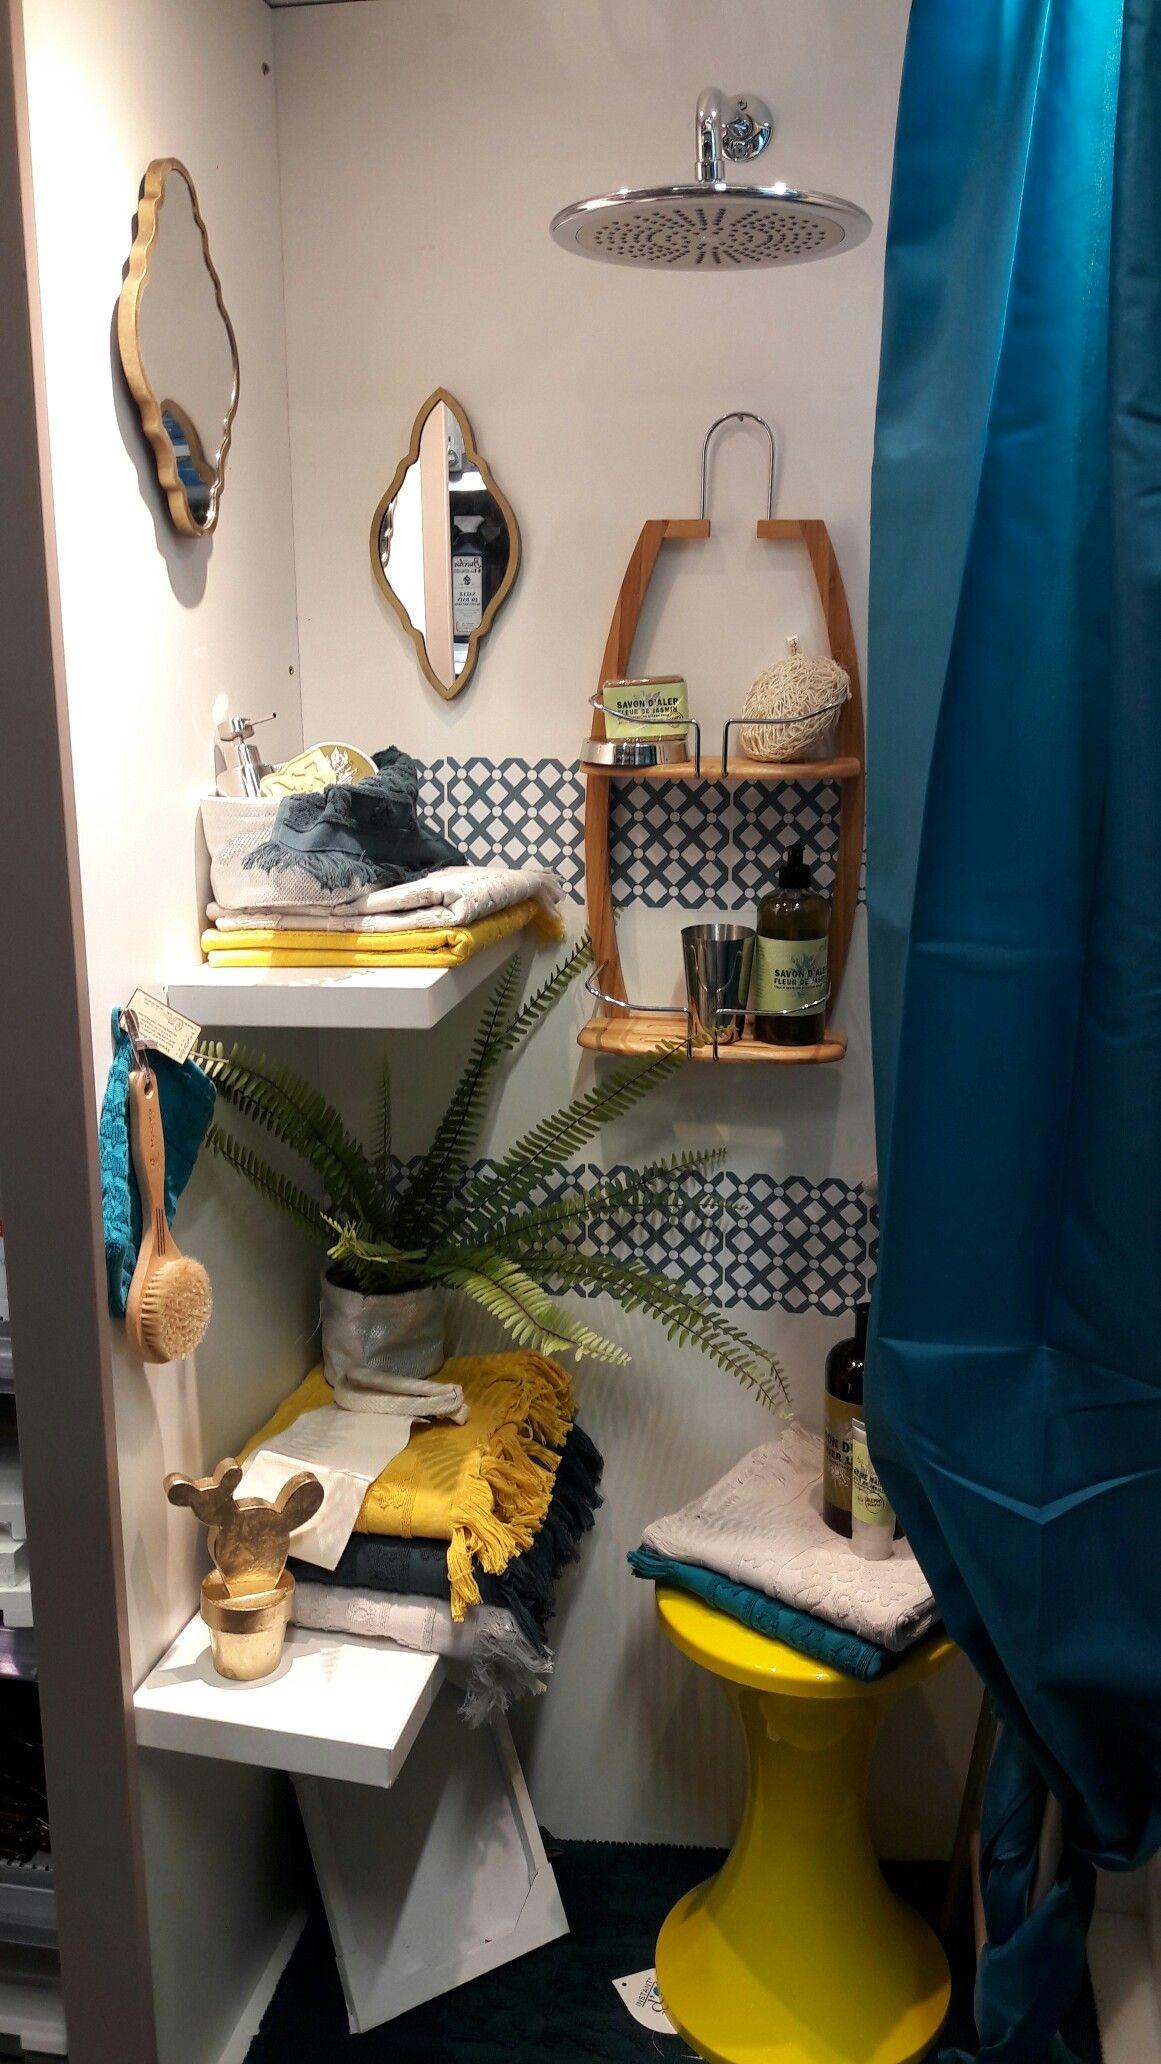 juillet 2016 salle de bains bleu jaune or